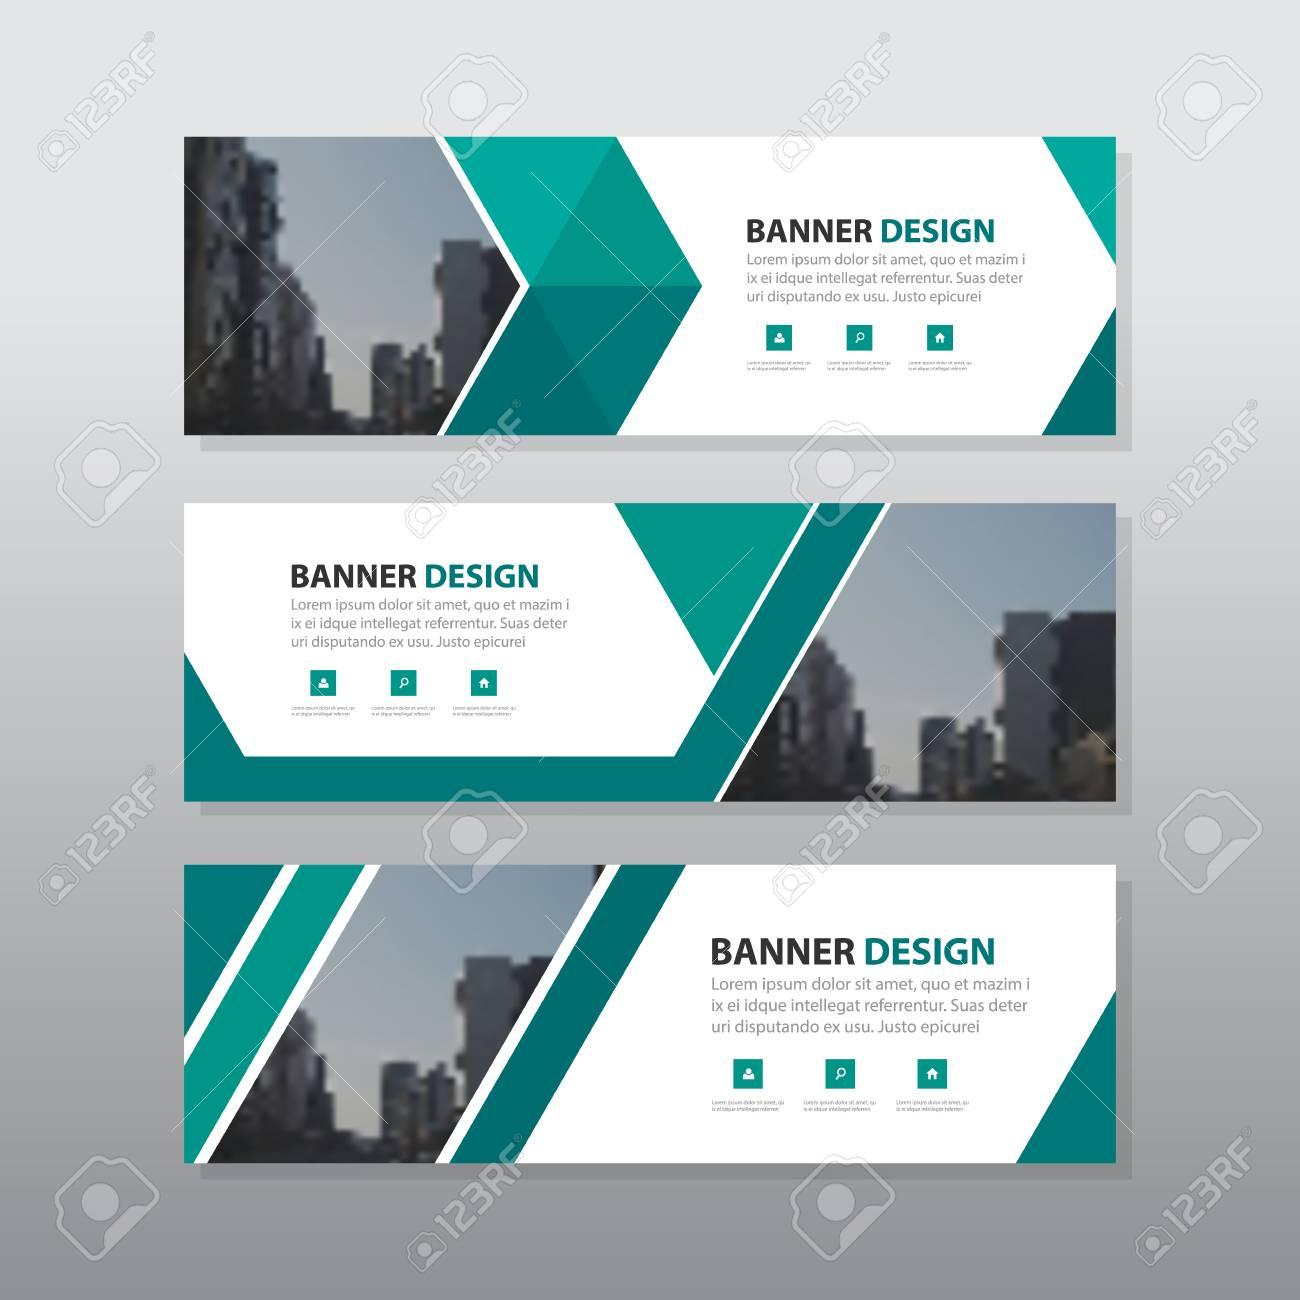 Wunderbar Amazon Webstore Vorlagen Fotos - Entry Level Resume ...